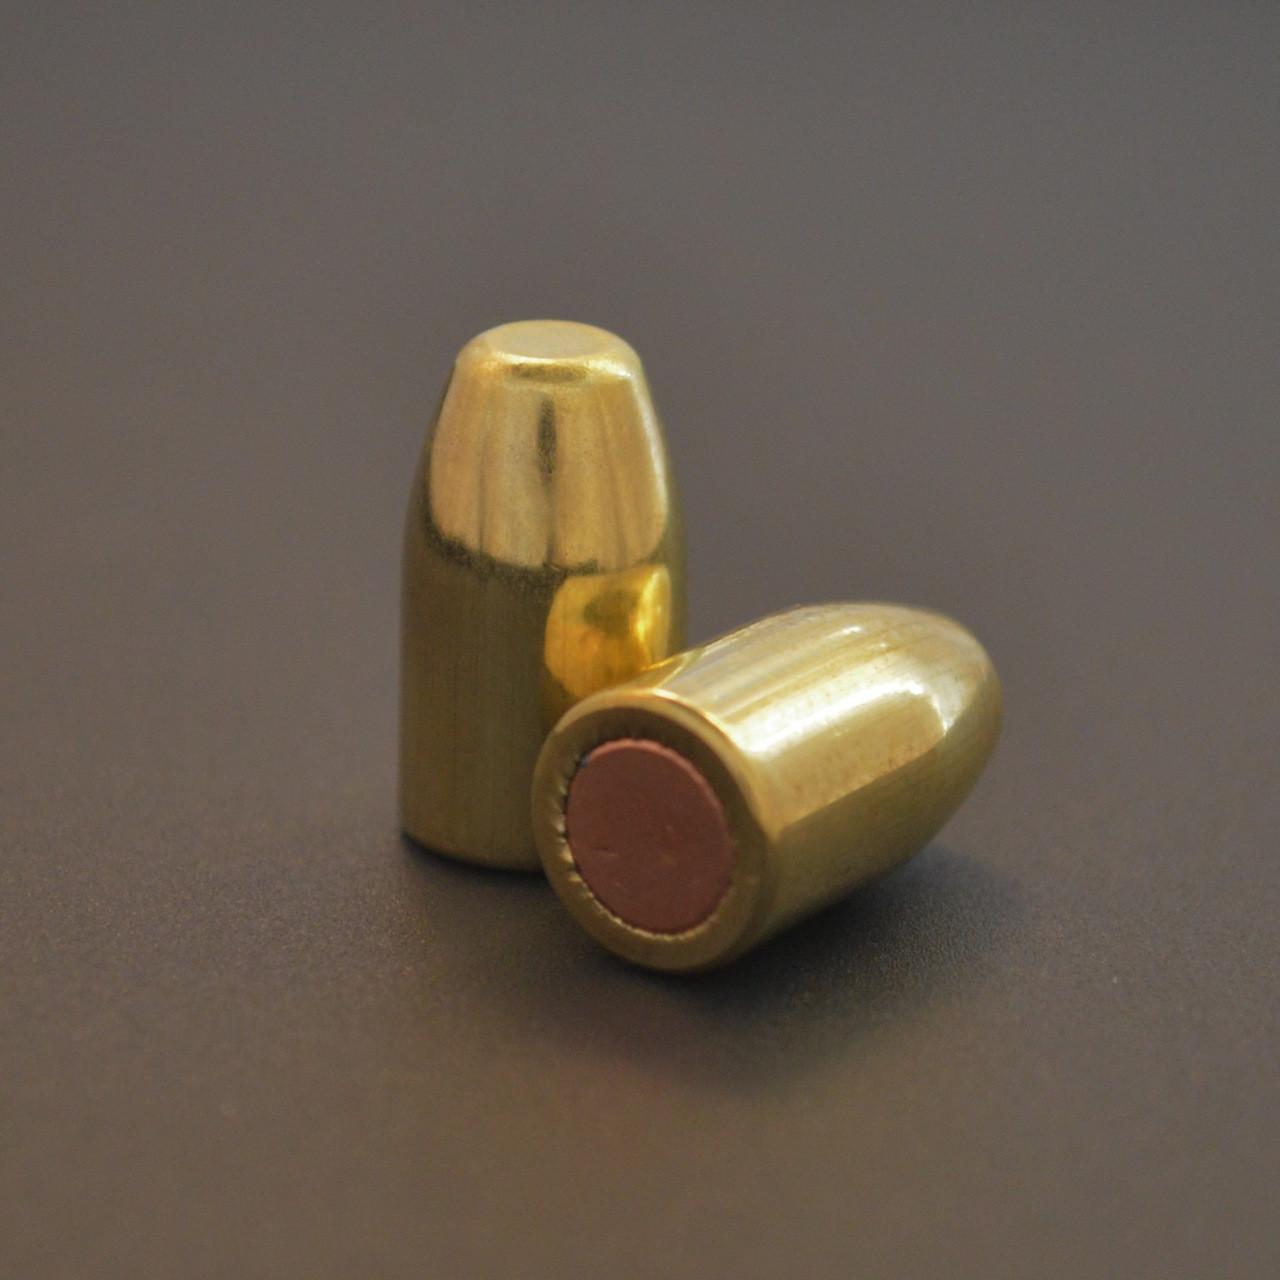 9mm/147gr CMJ - 1,000ct